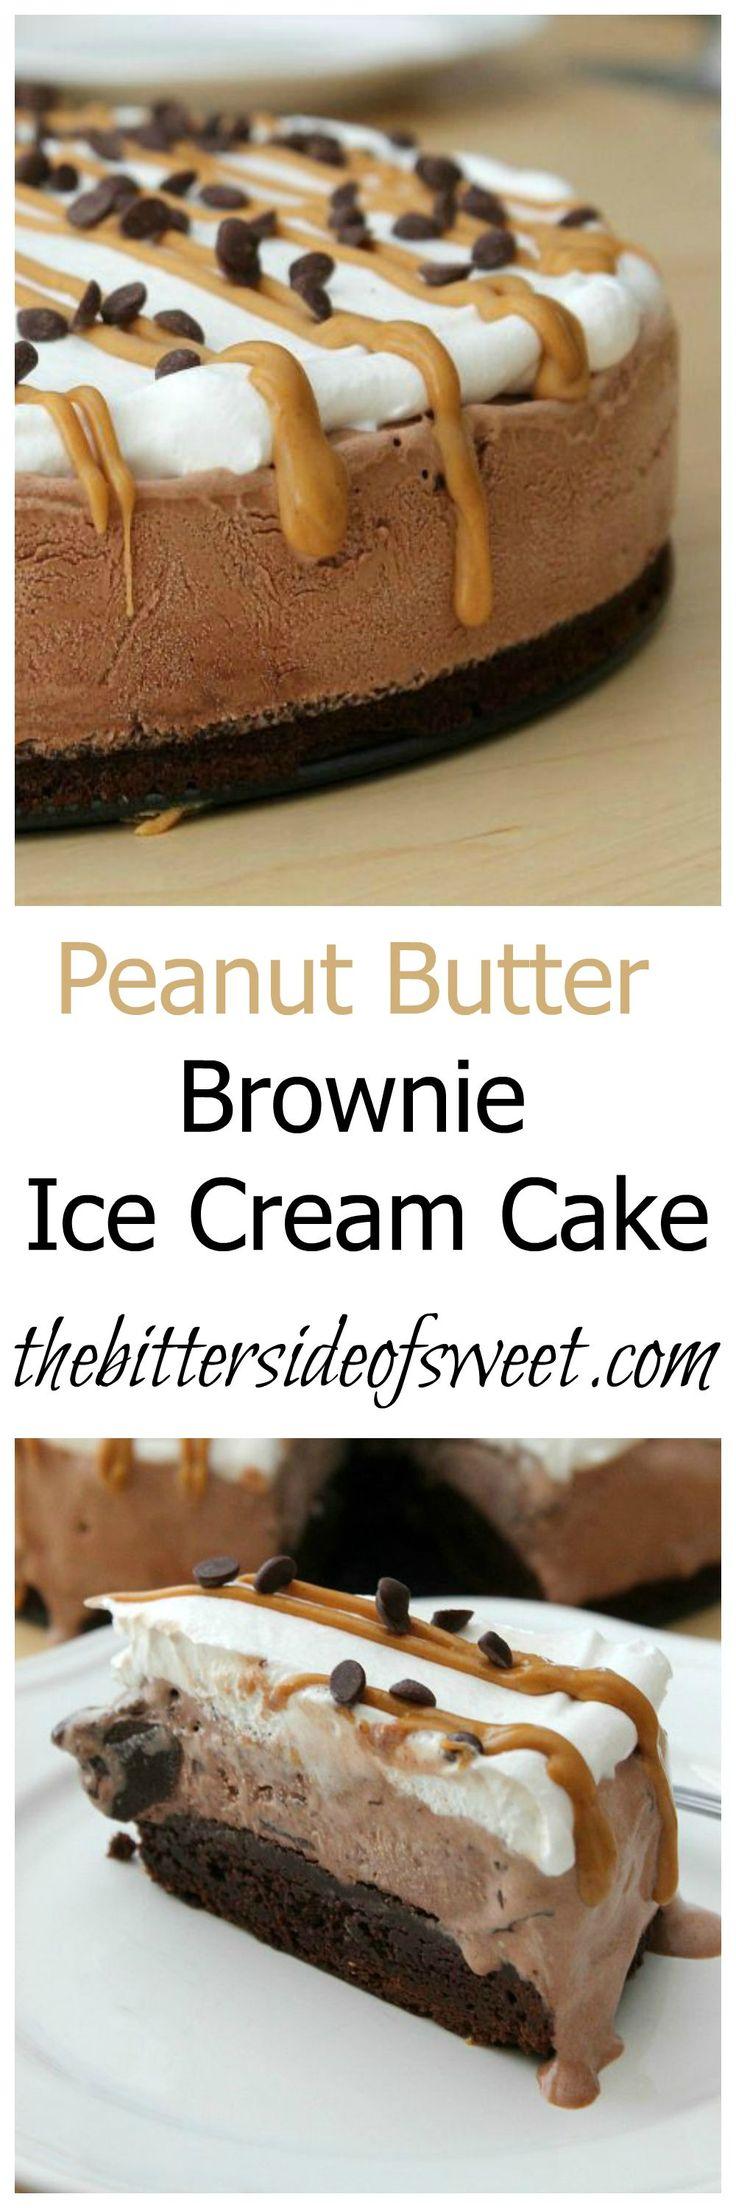 Peanut Butter Brownie Ice Cream Cake - theBitterSideofSweet